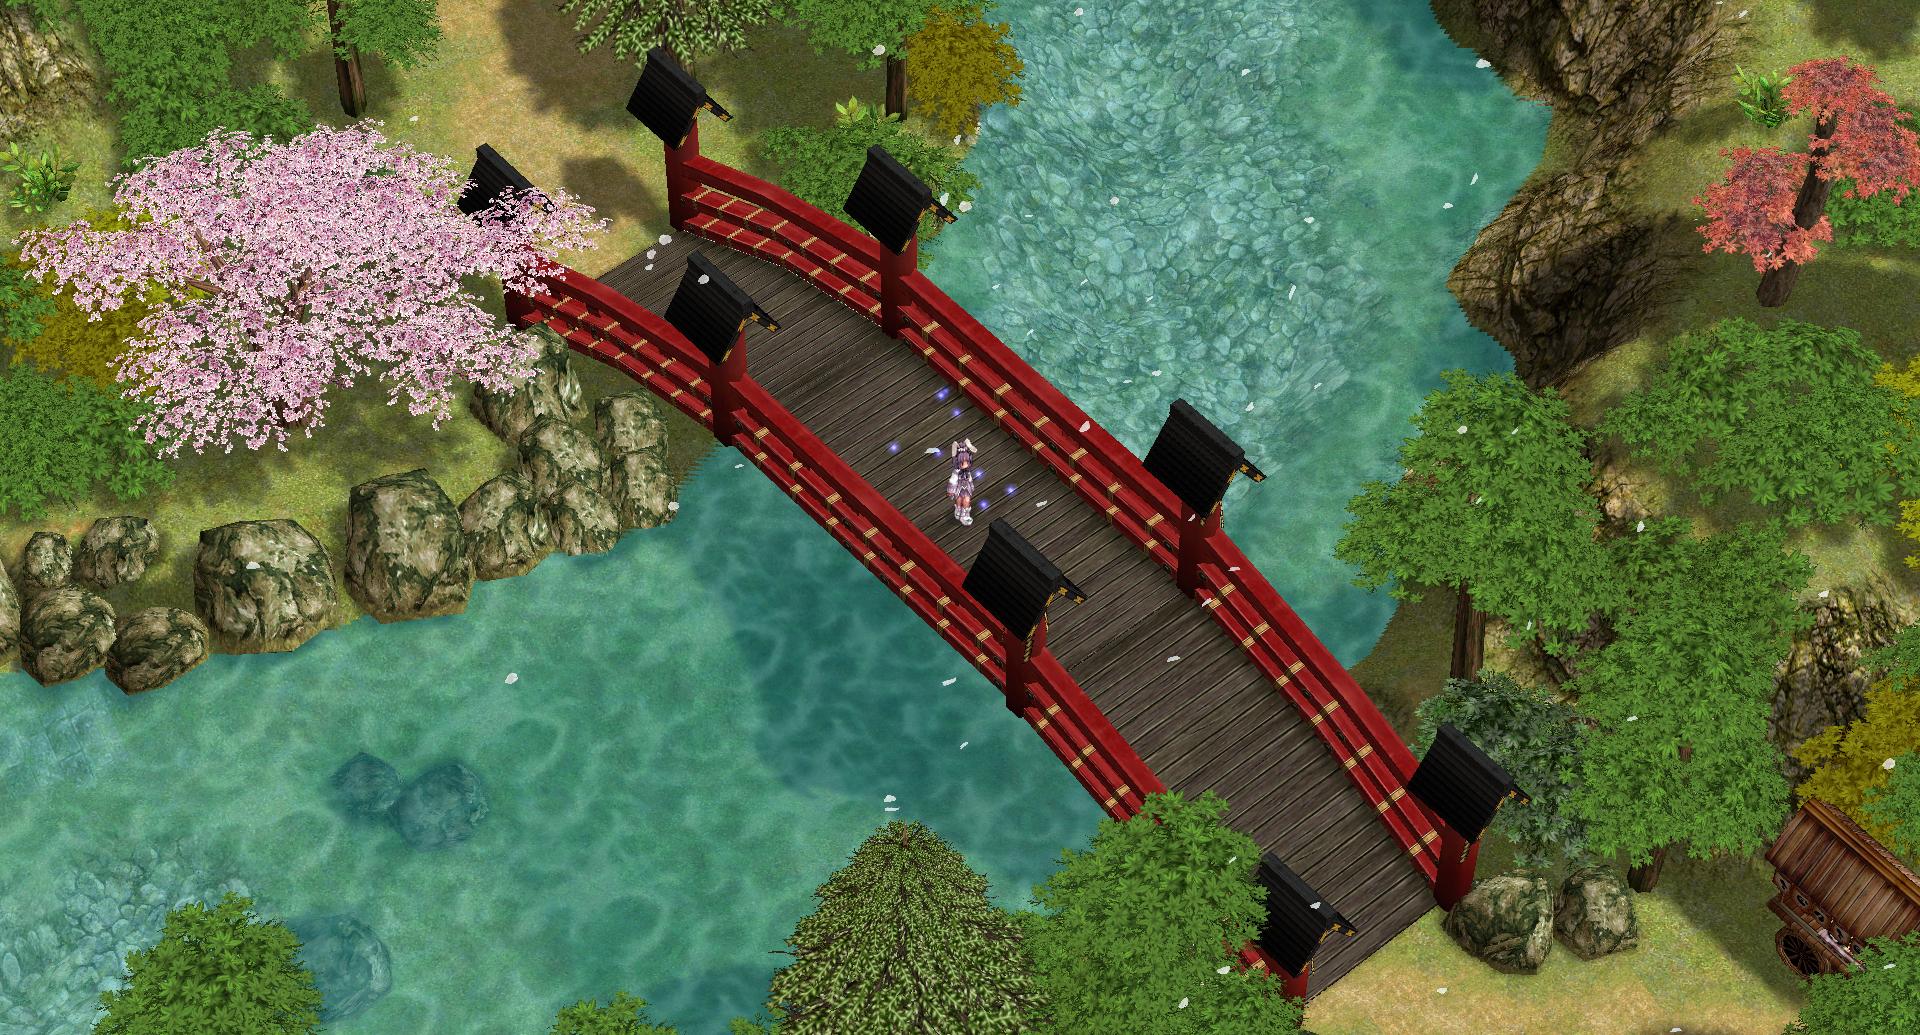 02_bridge_by_rabbitjk-dcfvhd9.jpg